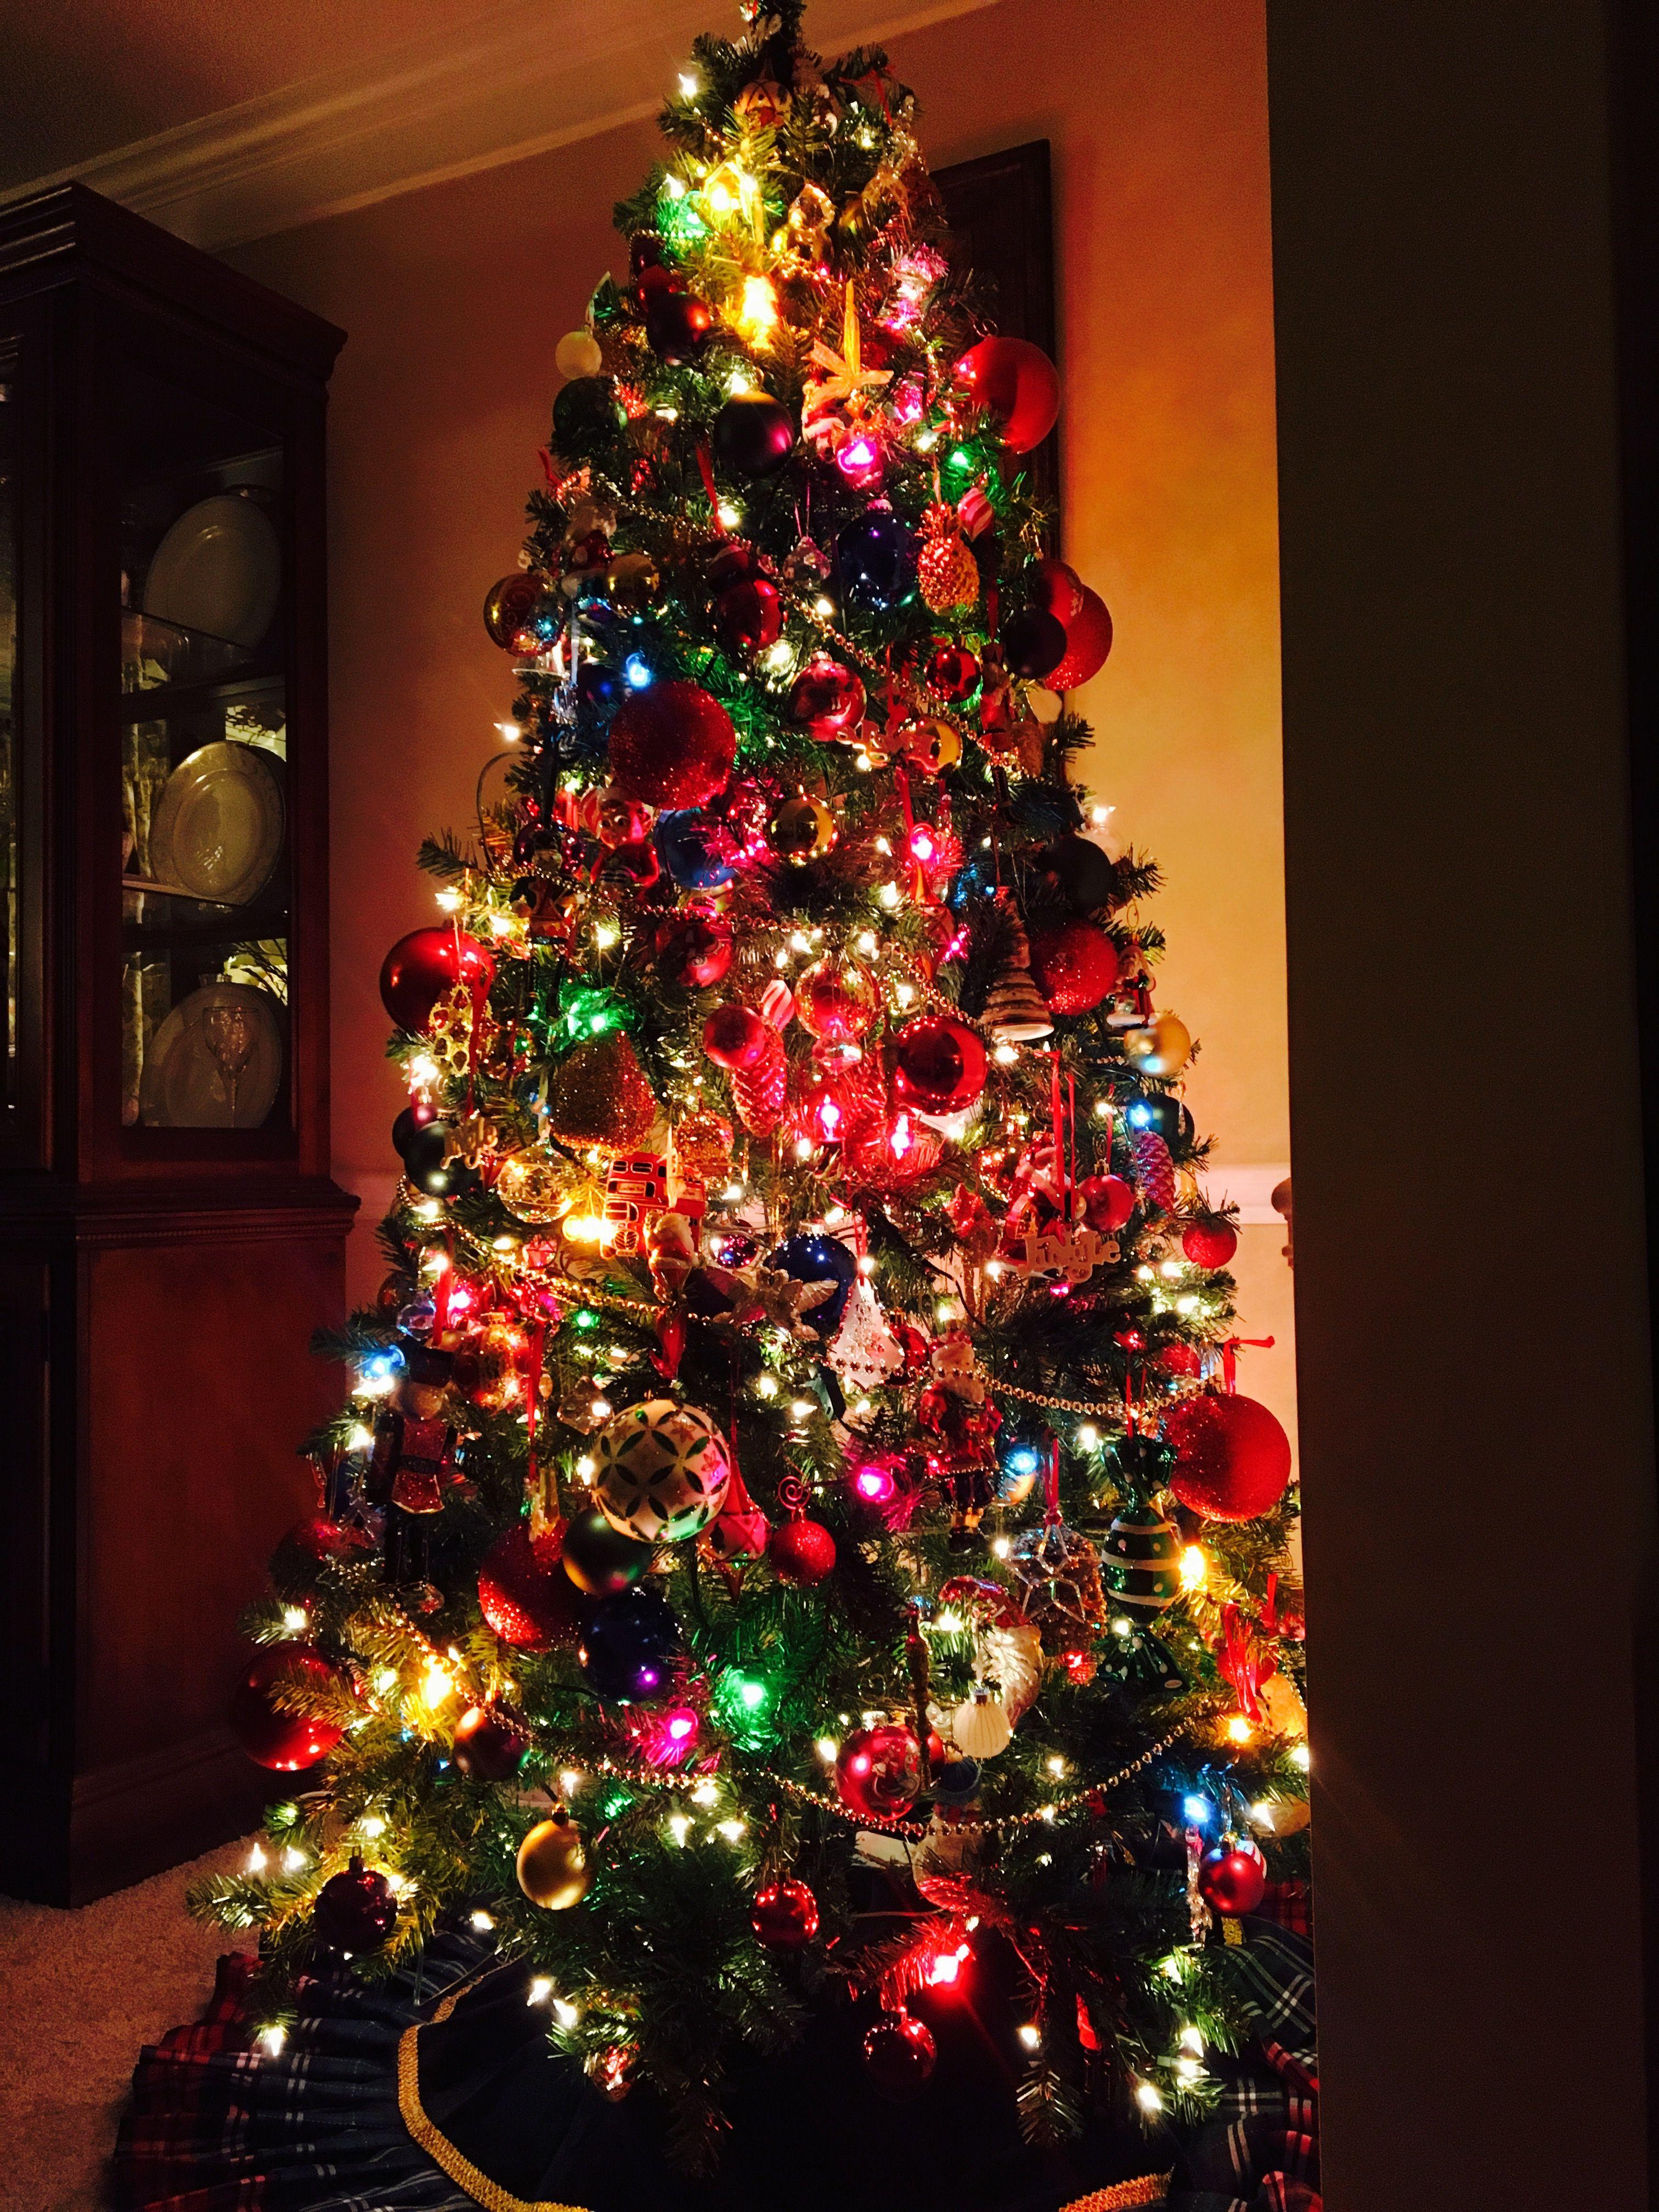 Christmas Tree With Multi Color Lights Christmas Tree With Coloured Lights Multi Colored Christmas Lights Decorating With Christmas Lights